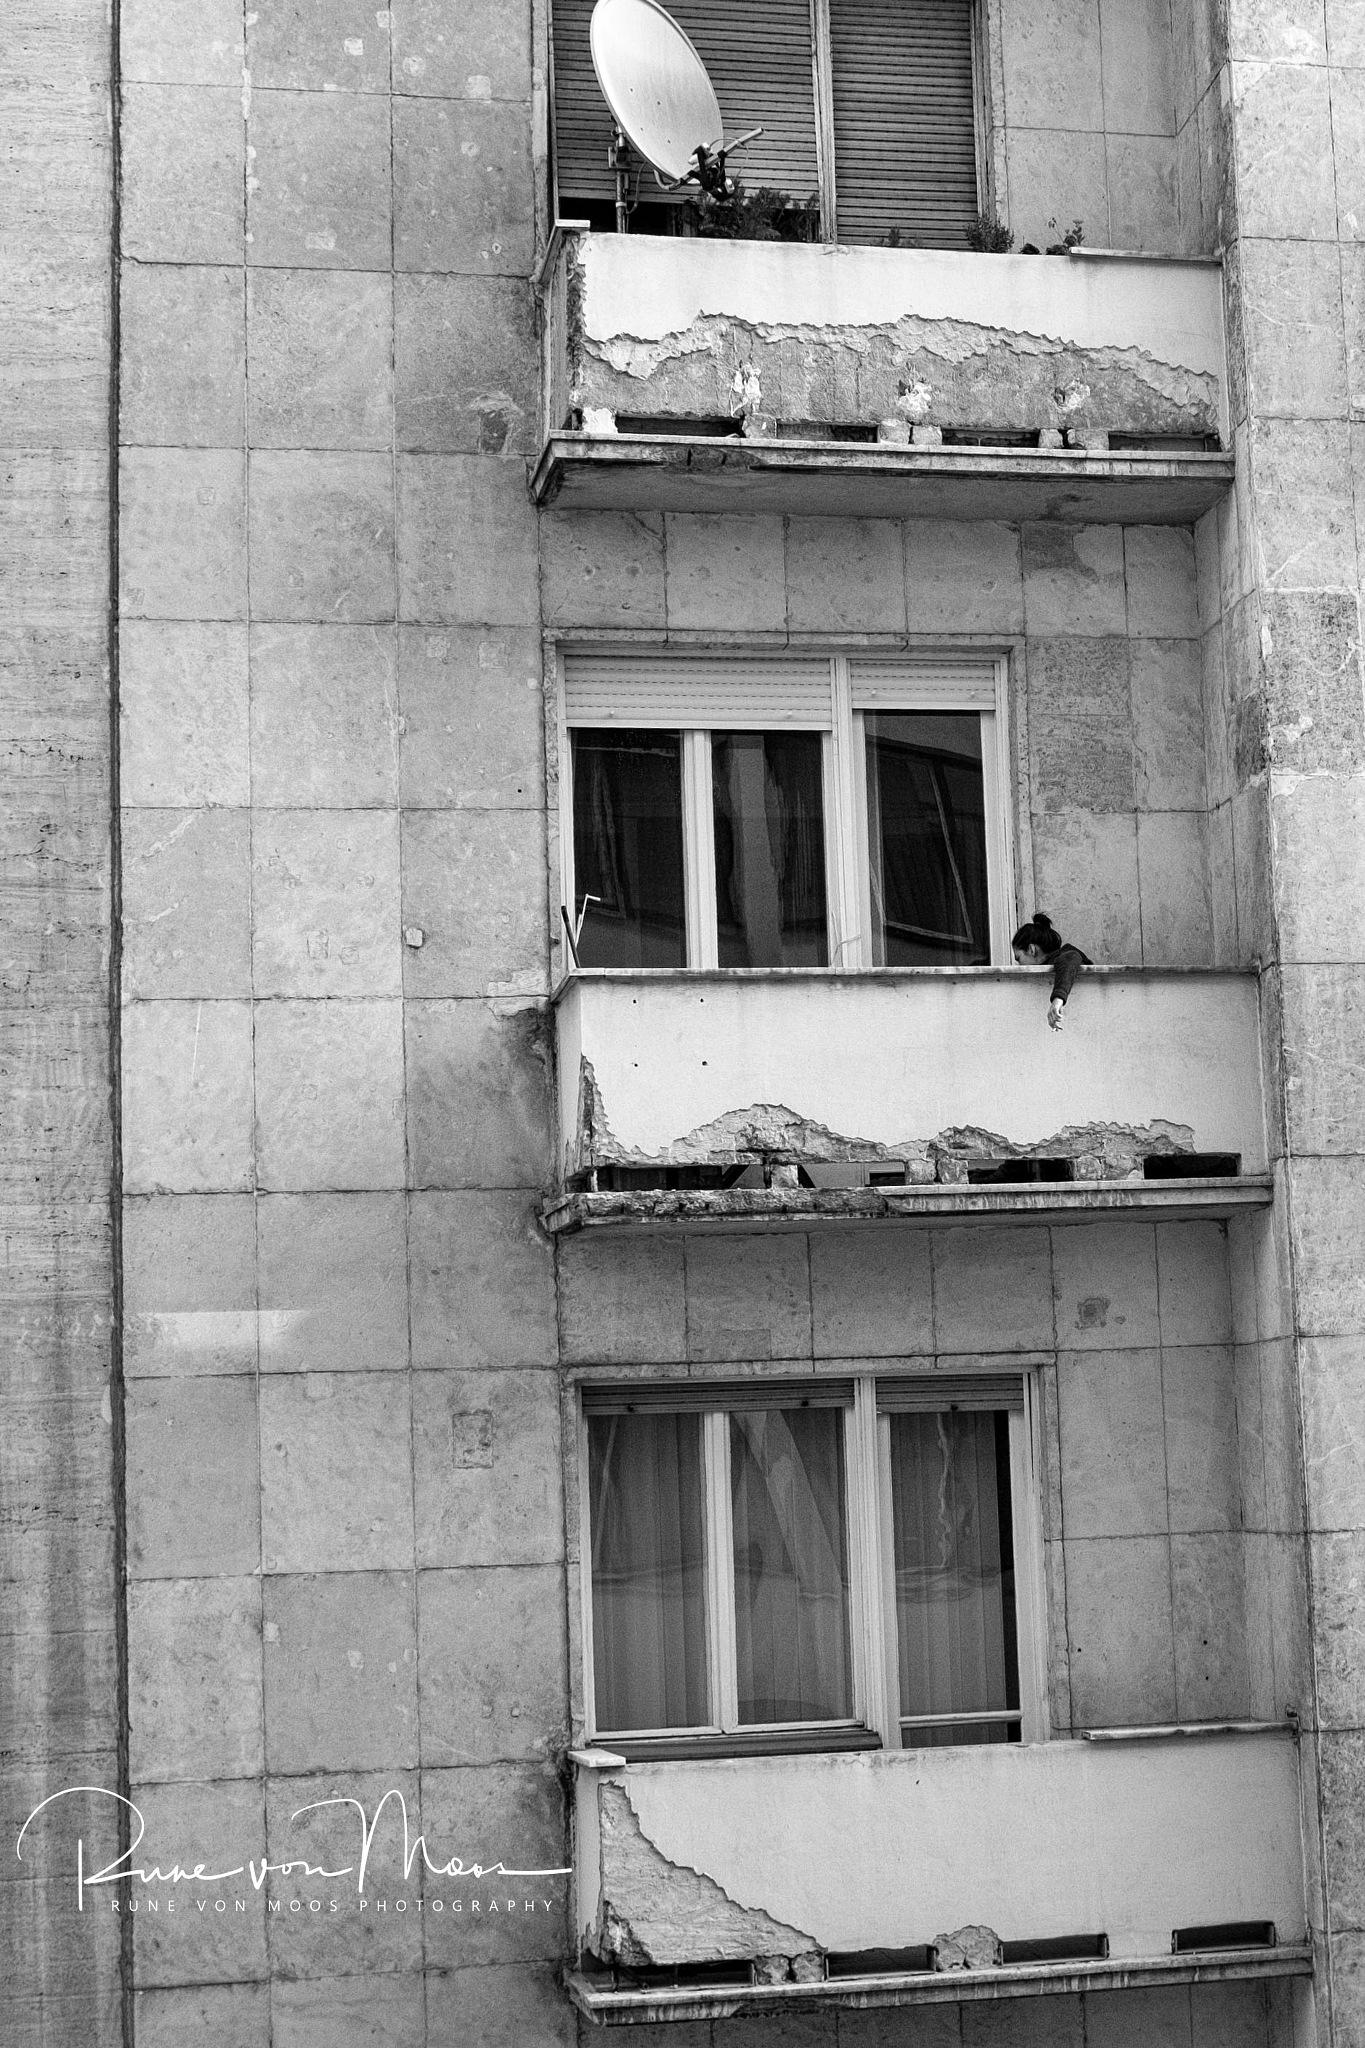 Balconies in Budapest by rvmFOTO